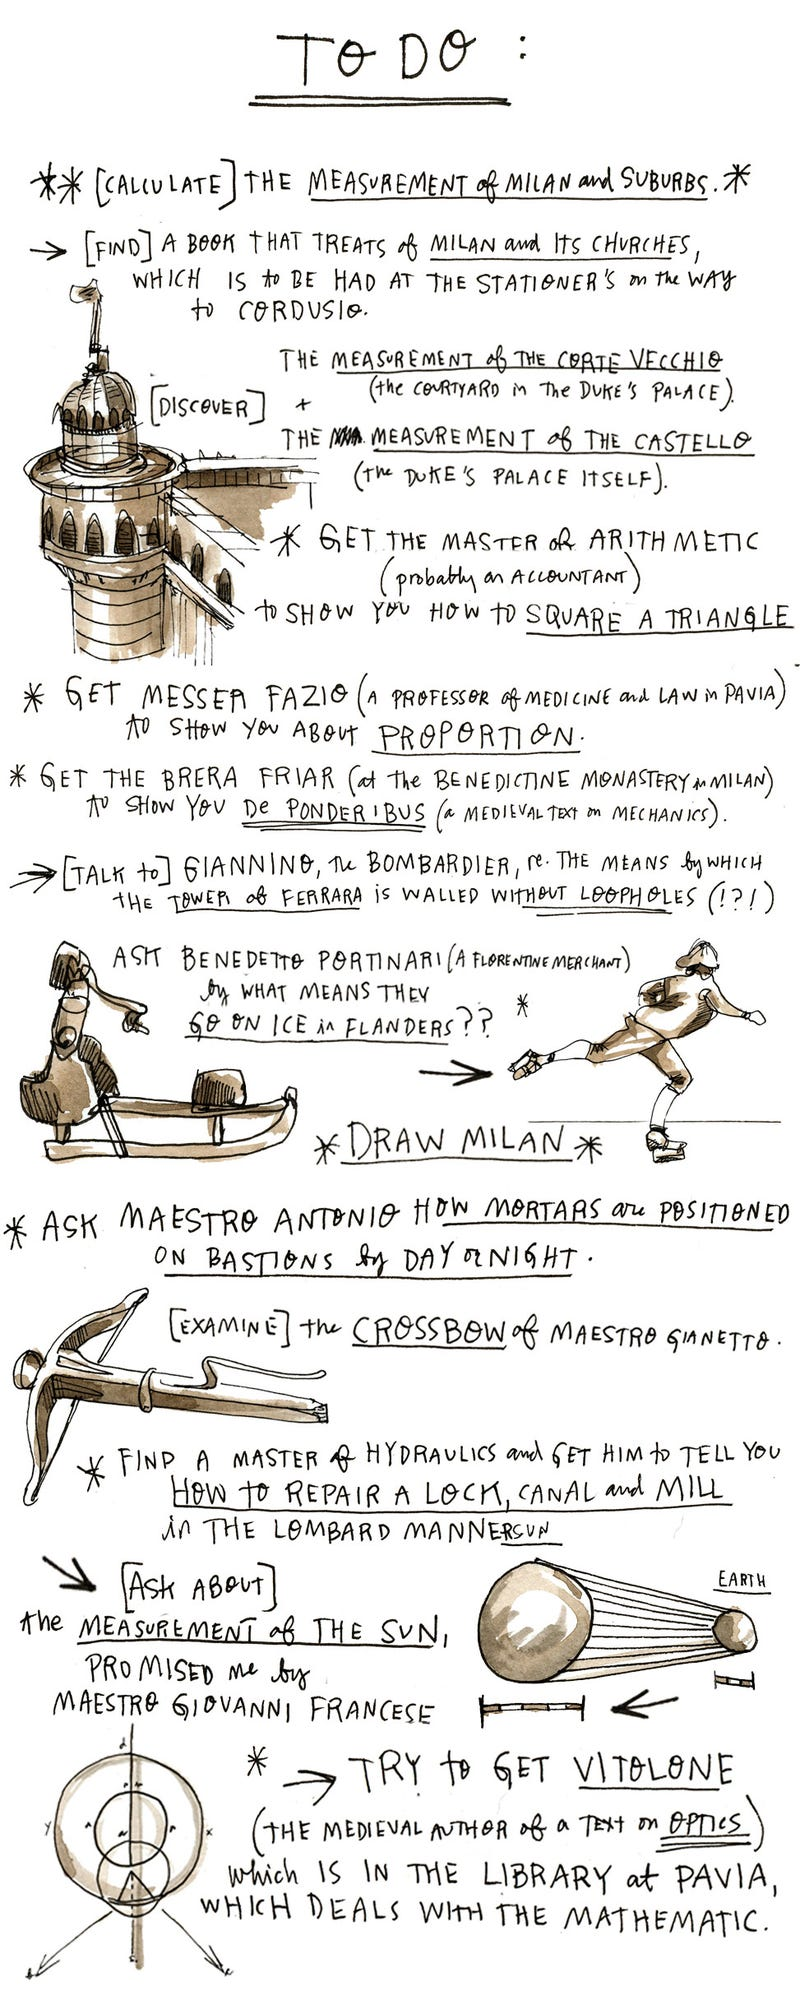 Here's What Leonardo da Vinci's To-Do List Looked Like in 1490